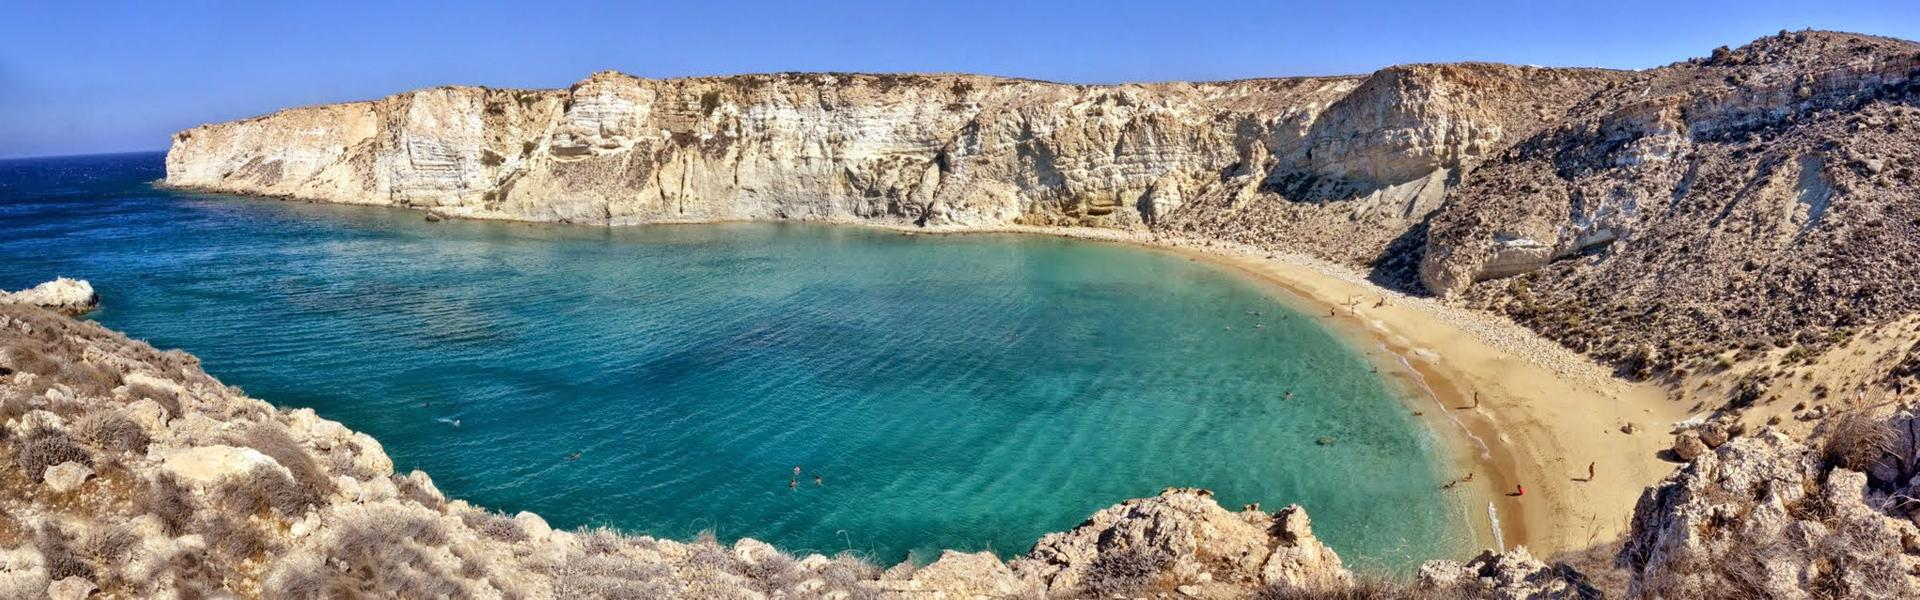 Koufonissi Island - Creta